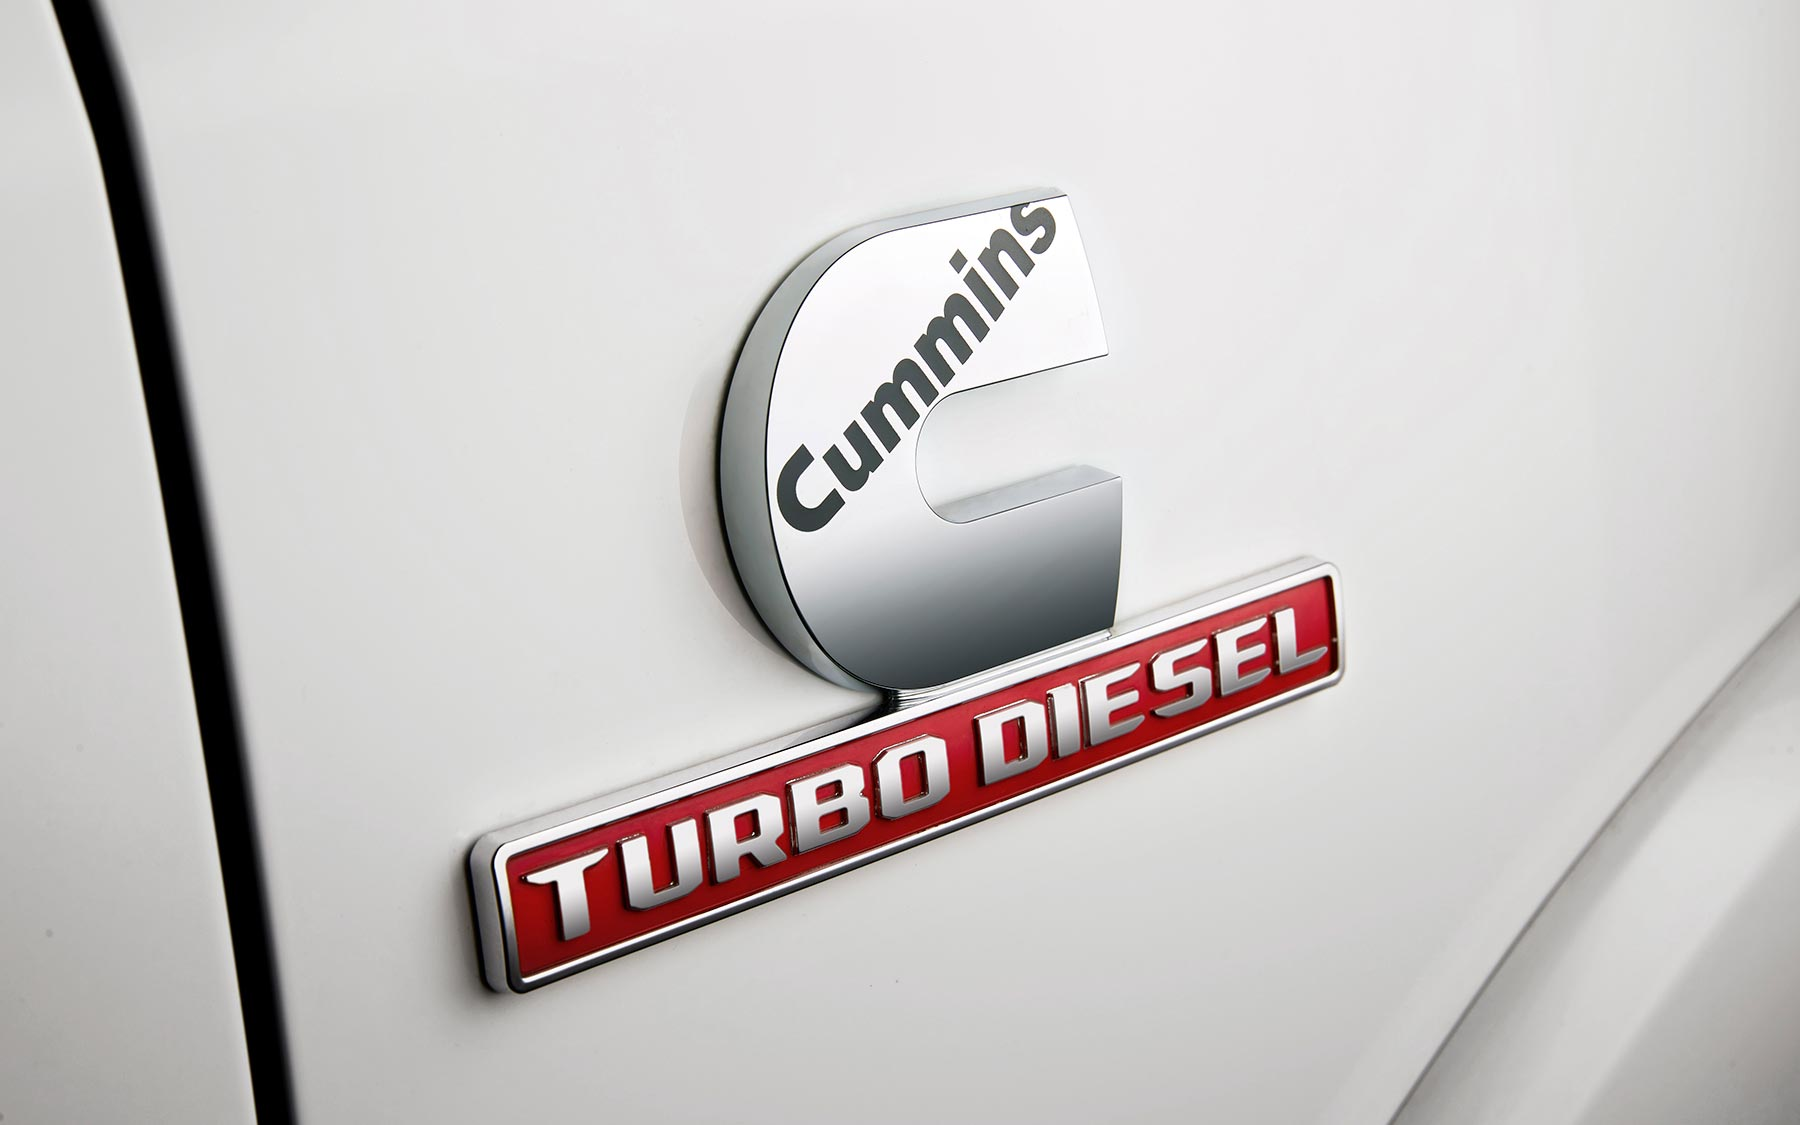 Class-exclusive Cummins Turbo Diesel